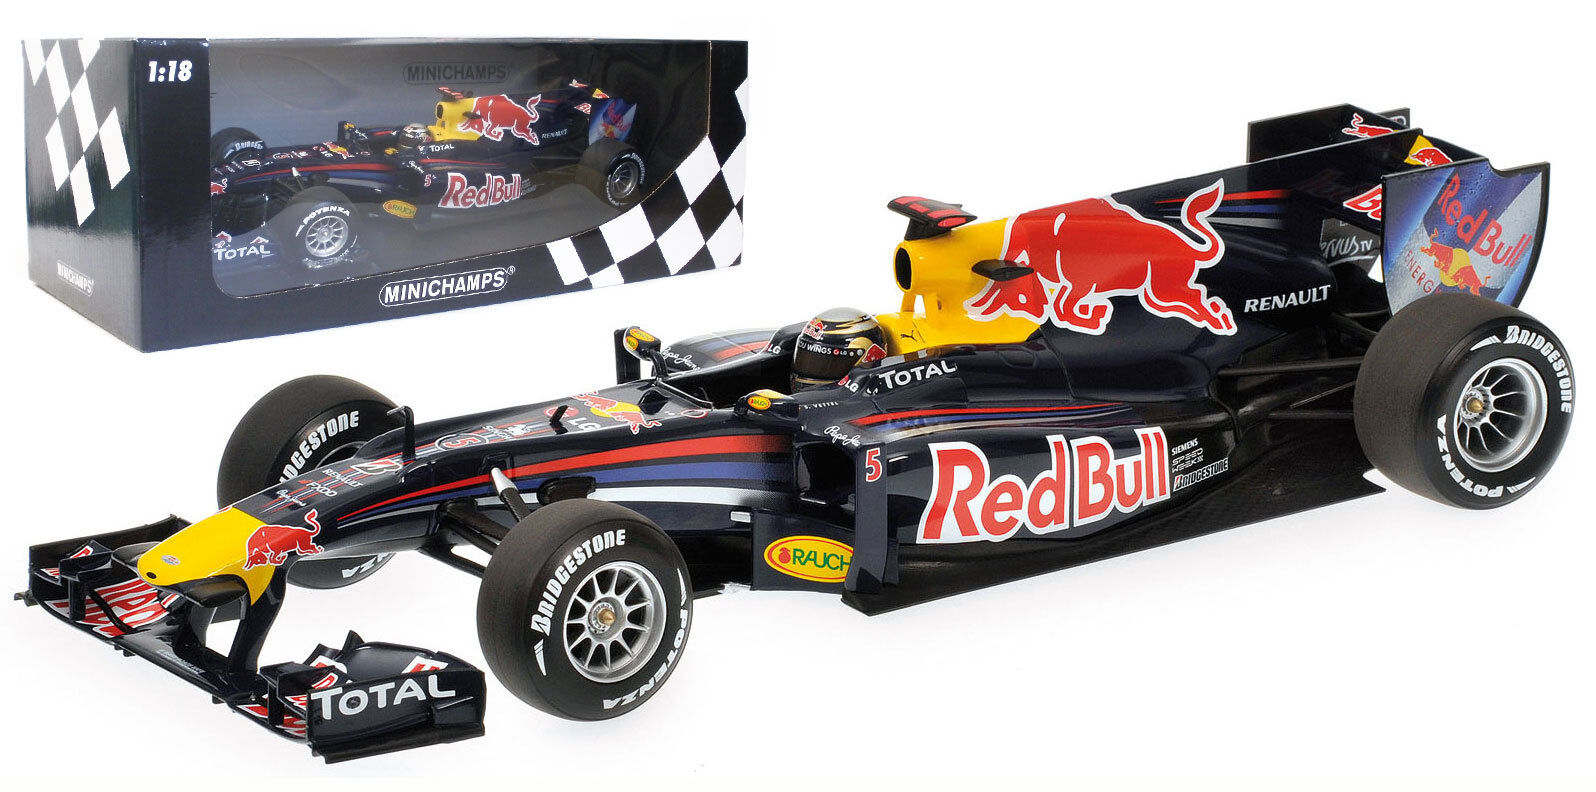 Minichamps Red Bull RB6 2010 - S Vettel 2010 2010 2010 World Champion 1 18 Scale c57e3f